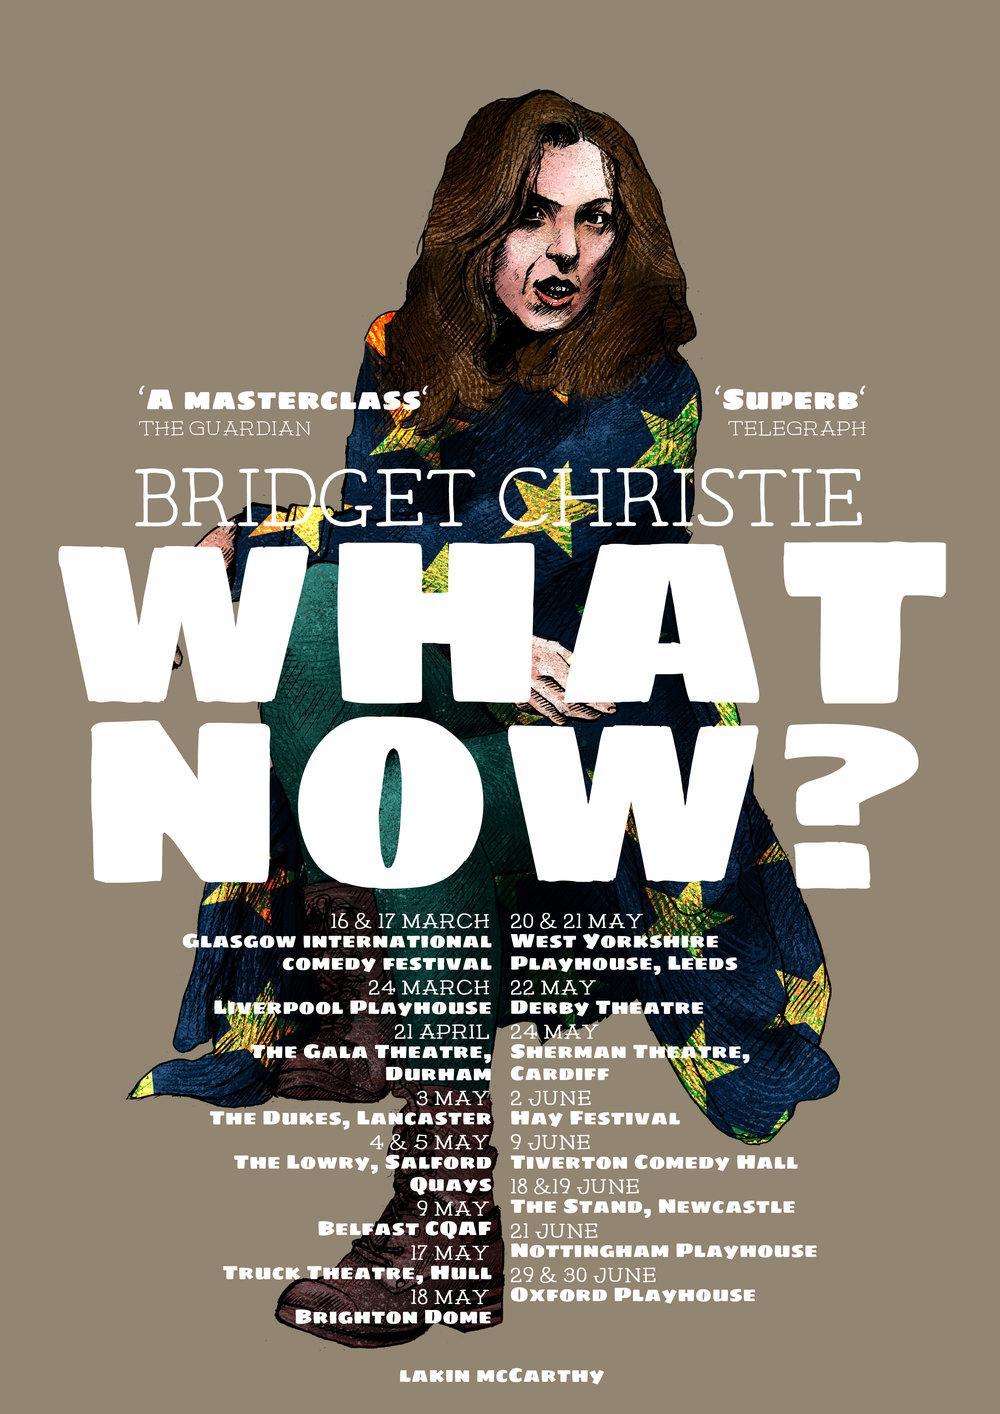 The final version of Bridget Christie's poster